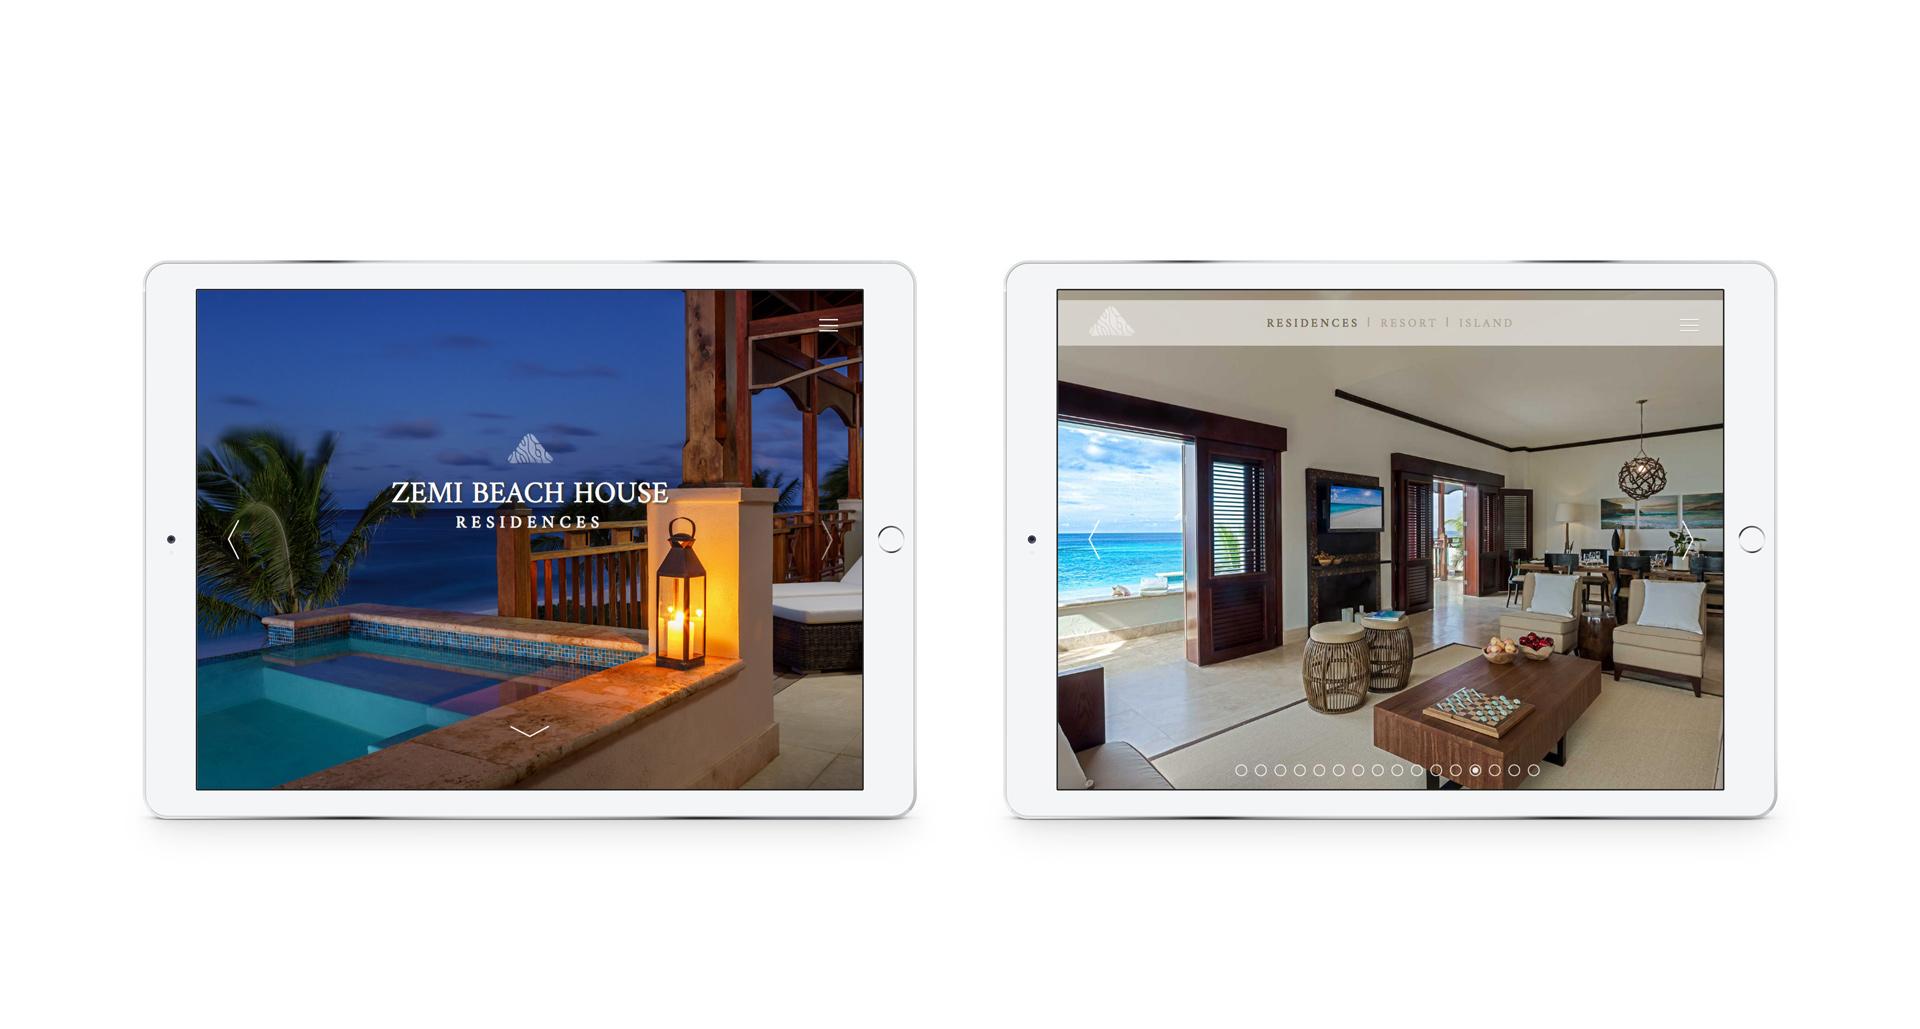 Responsive website viewed on a pair of iPads | Luxury resort marketing | Zemi Beach